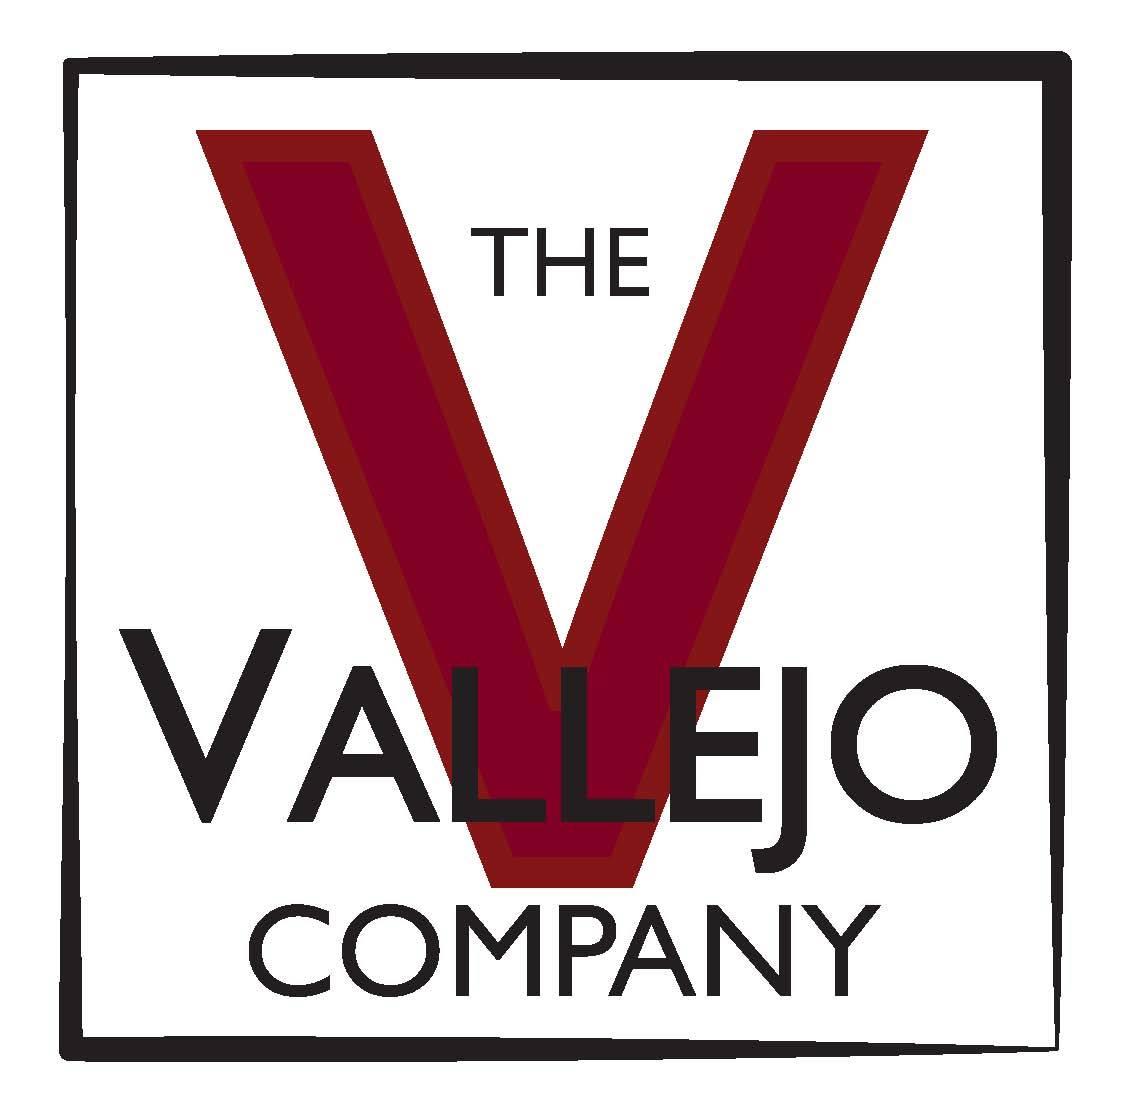 The Vallejo Company